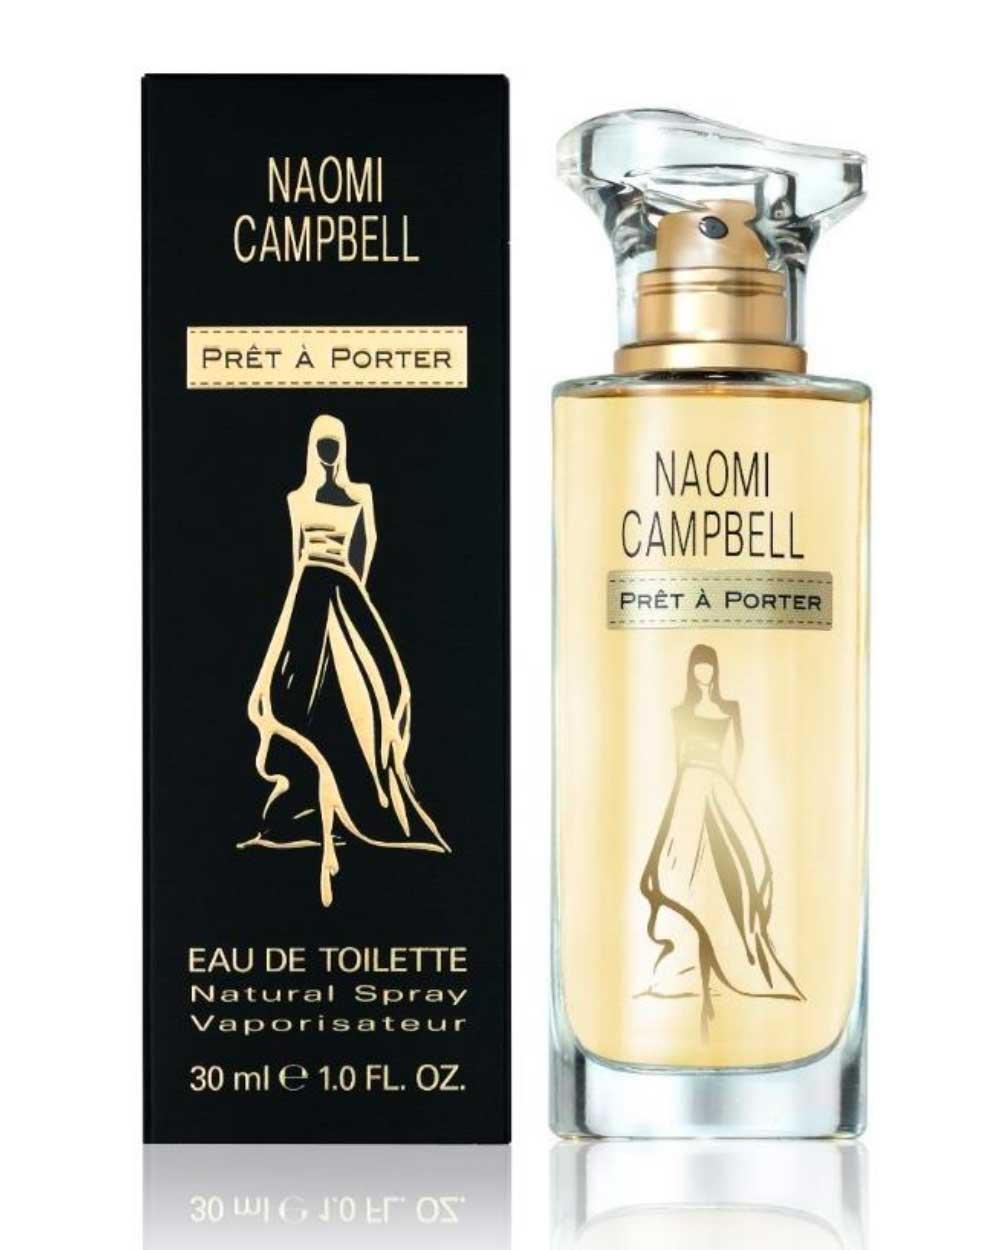 Pret A Porter Naomi Campbell аромат аромат для женщин 2016